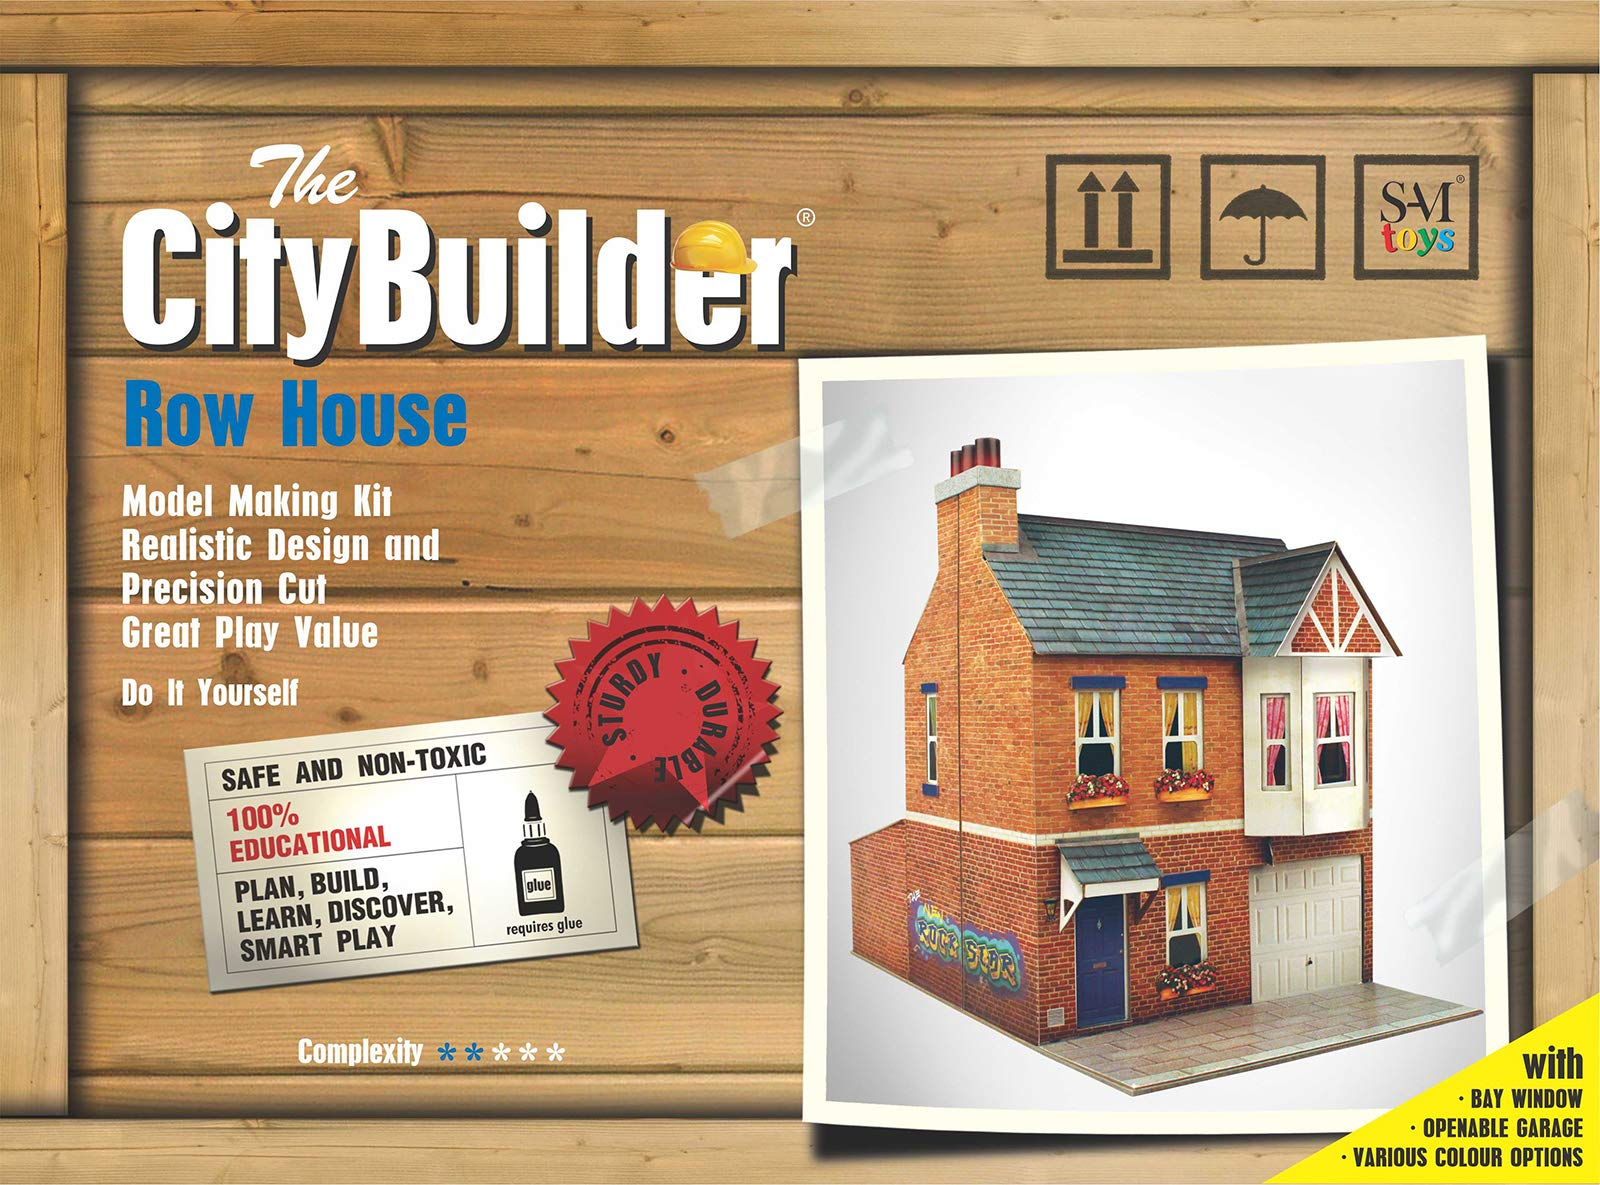 The CityBuilder O Gauge 1:48 Scale Row House Cardboard Model Making Kit Model Railroad Building